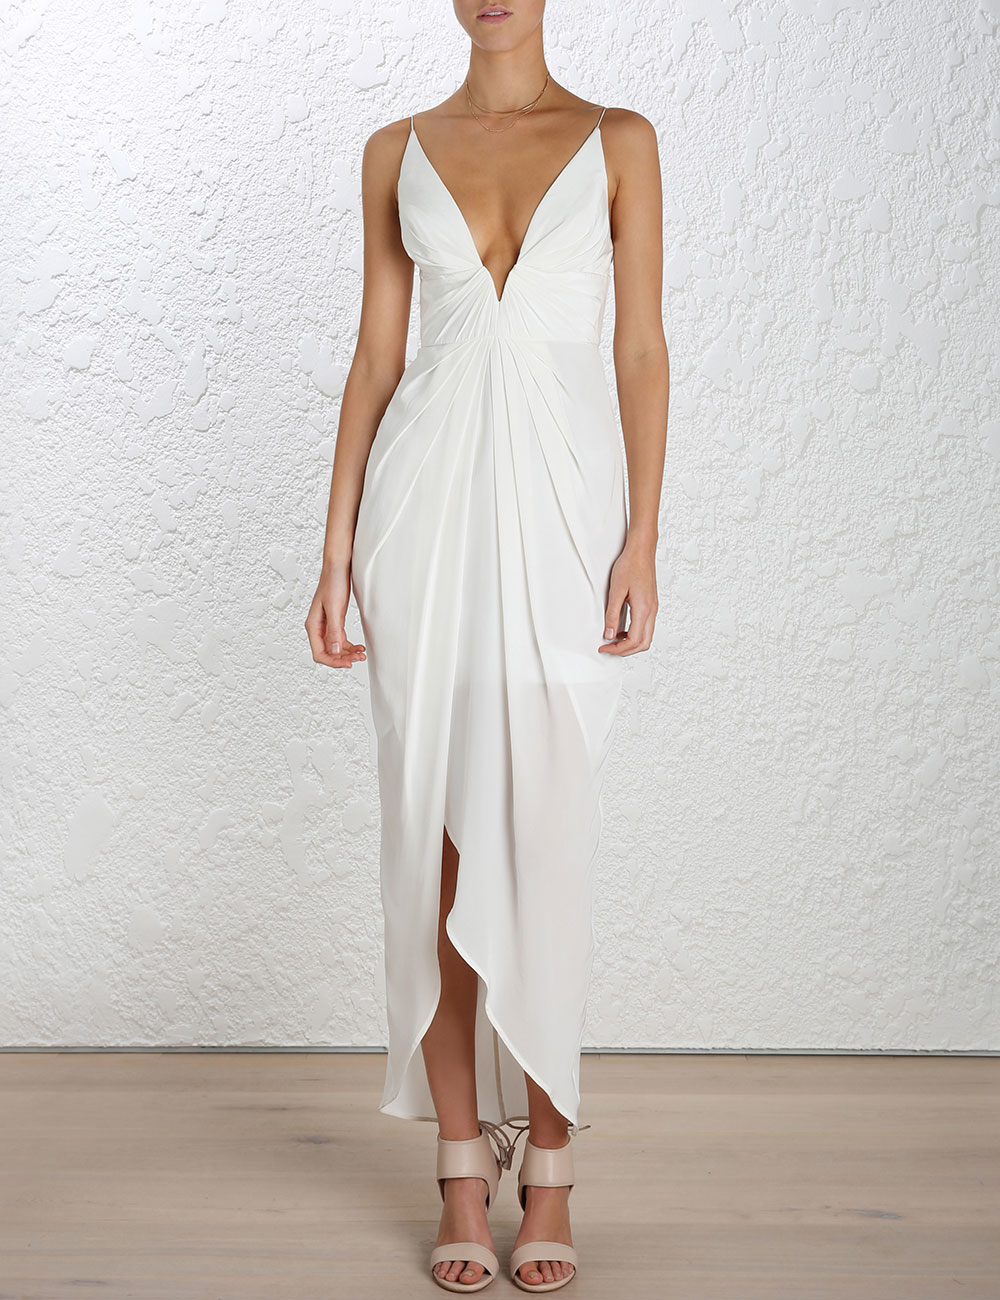 Zimmerman evening dresses